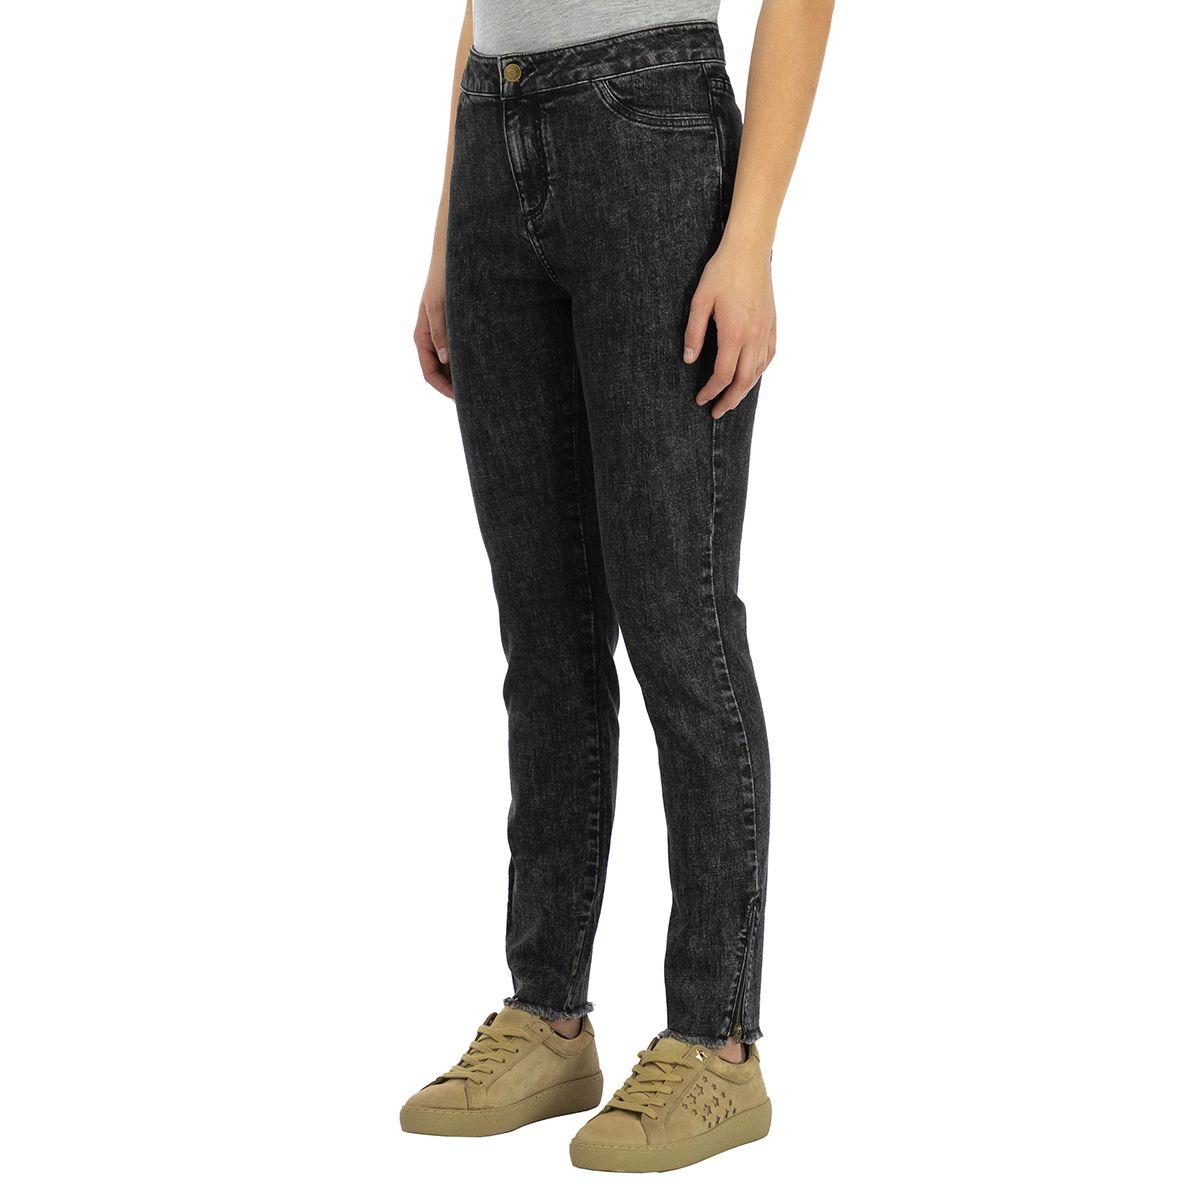 Armani Exchange 5 Pockets Pants